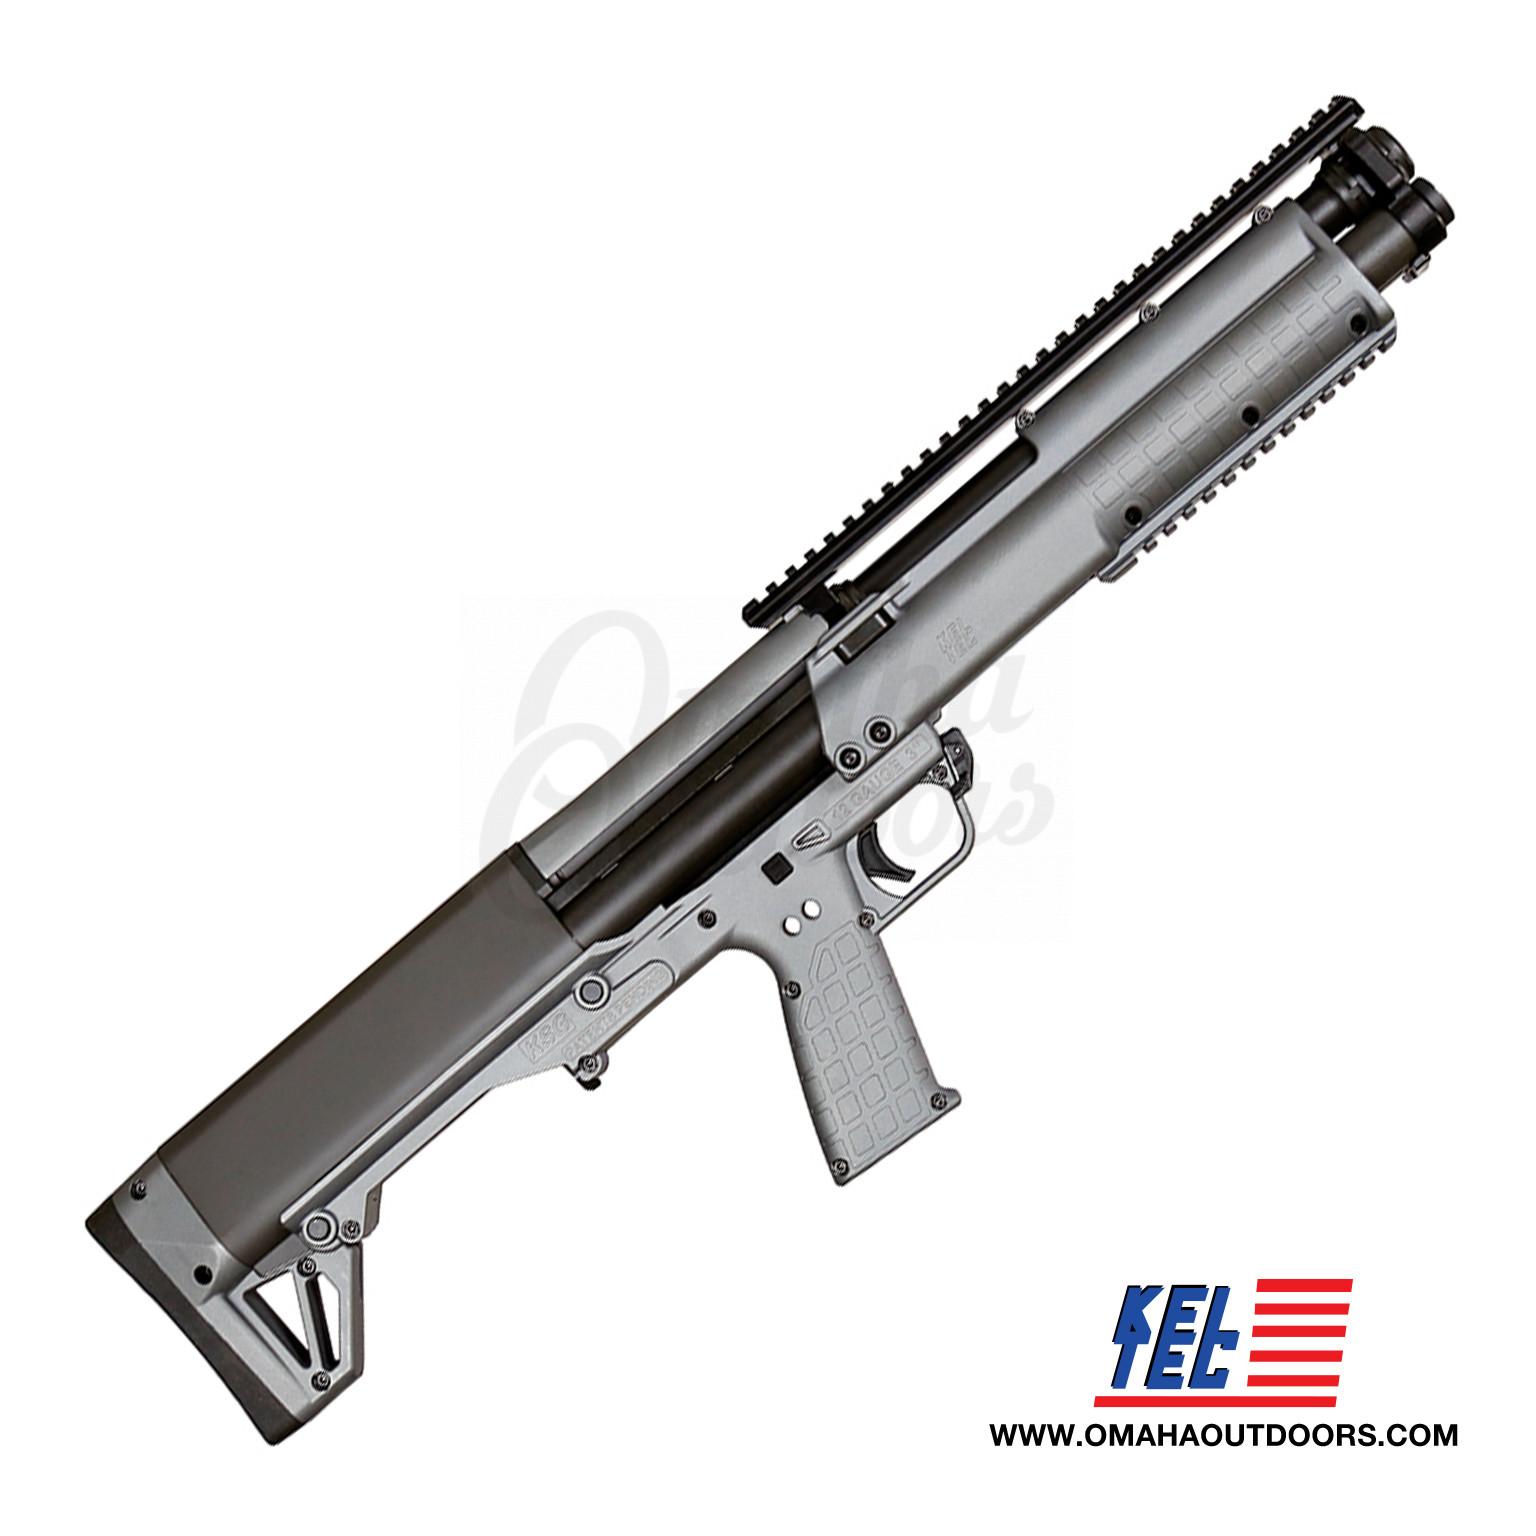 Kel-Tec KSG Pump Shotgun 12 Gauge 6+6 RD 18 5″ Sniper Gray Synthetic Stock  KSGSNGY